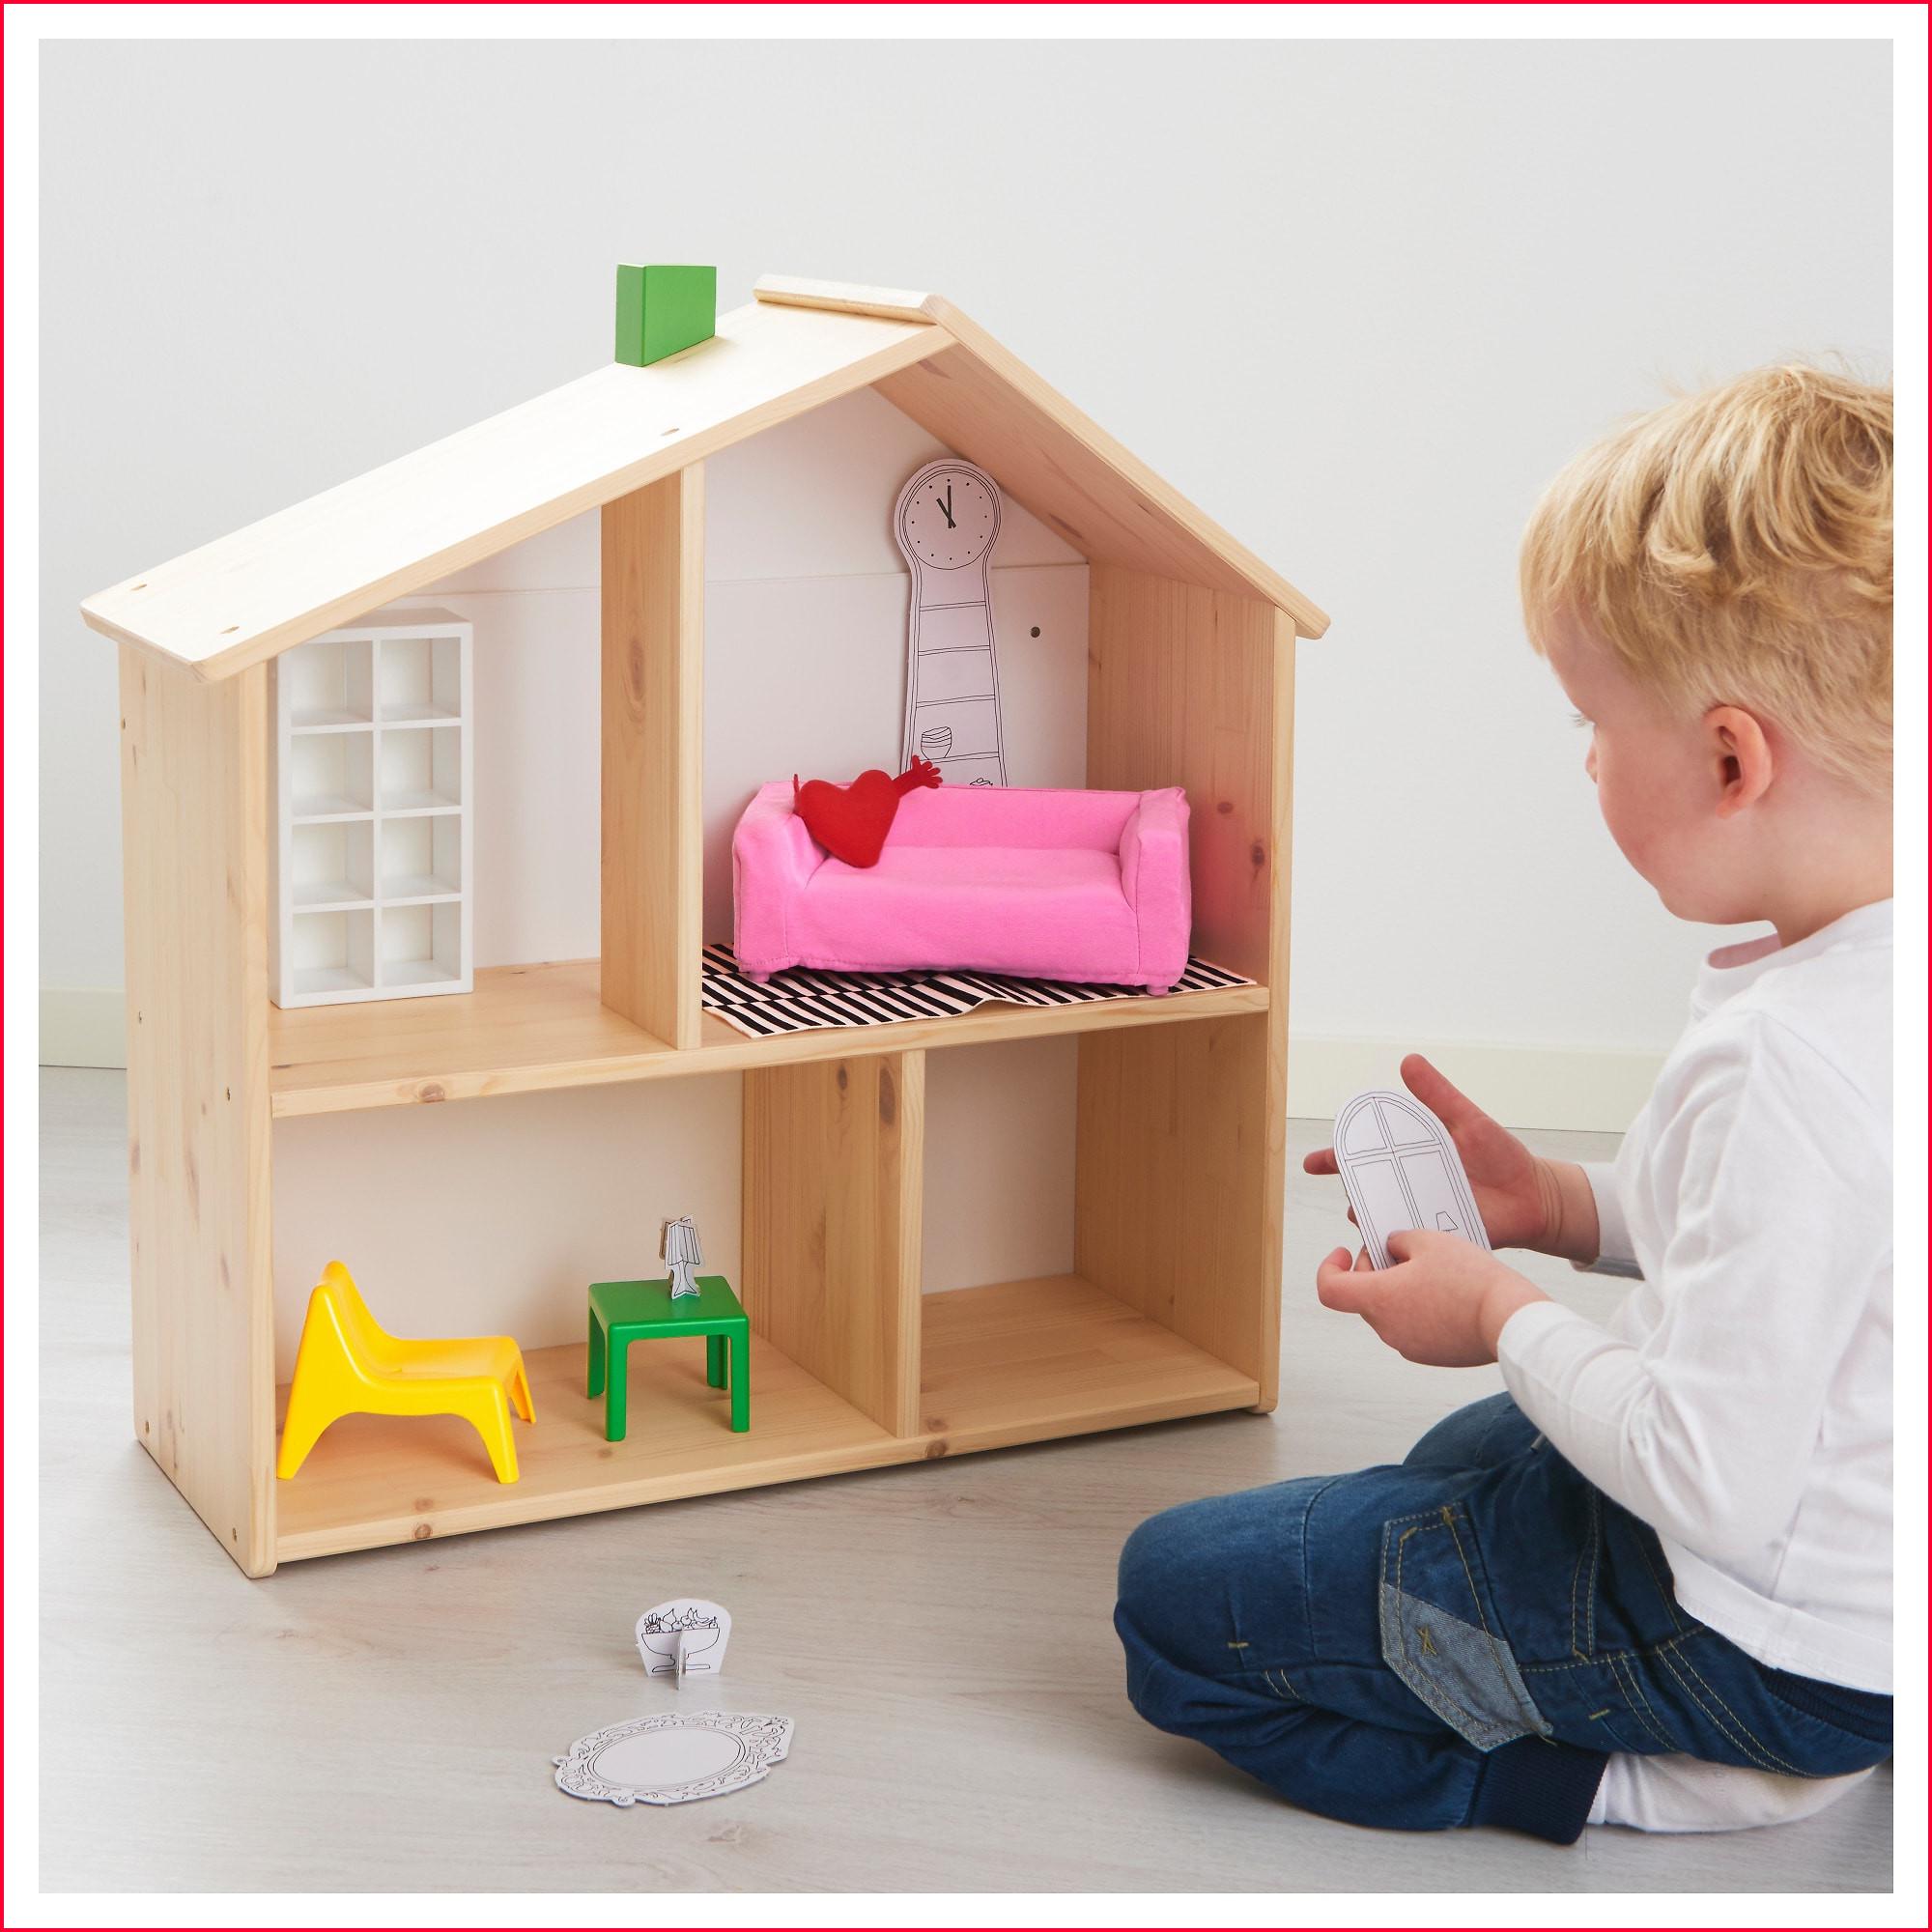 Armarios Ikea Niños U3dh Armarios Para Muà Ecas Huset Mobiliario MuEcas SalN Ikea